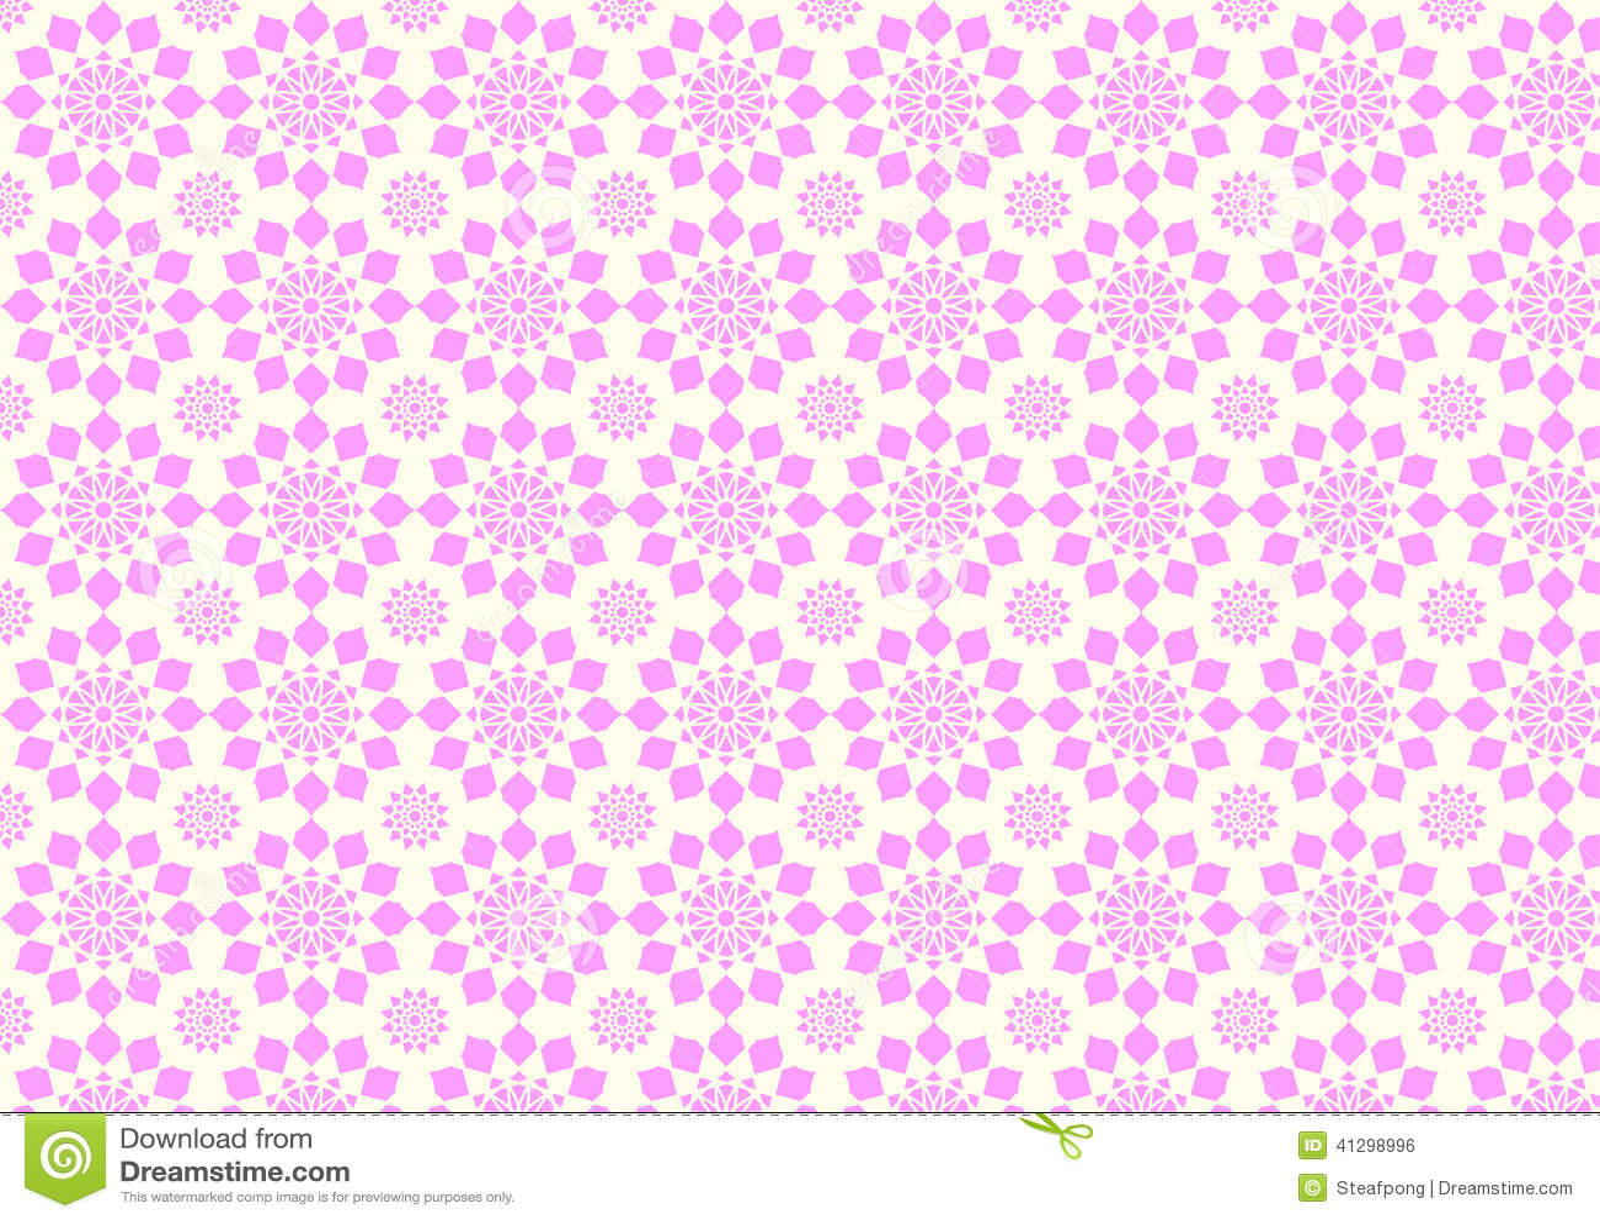 Vintage pastel pattern - photo#50